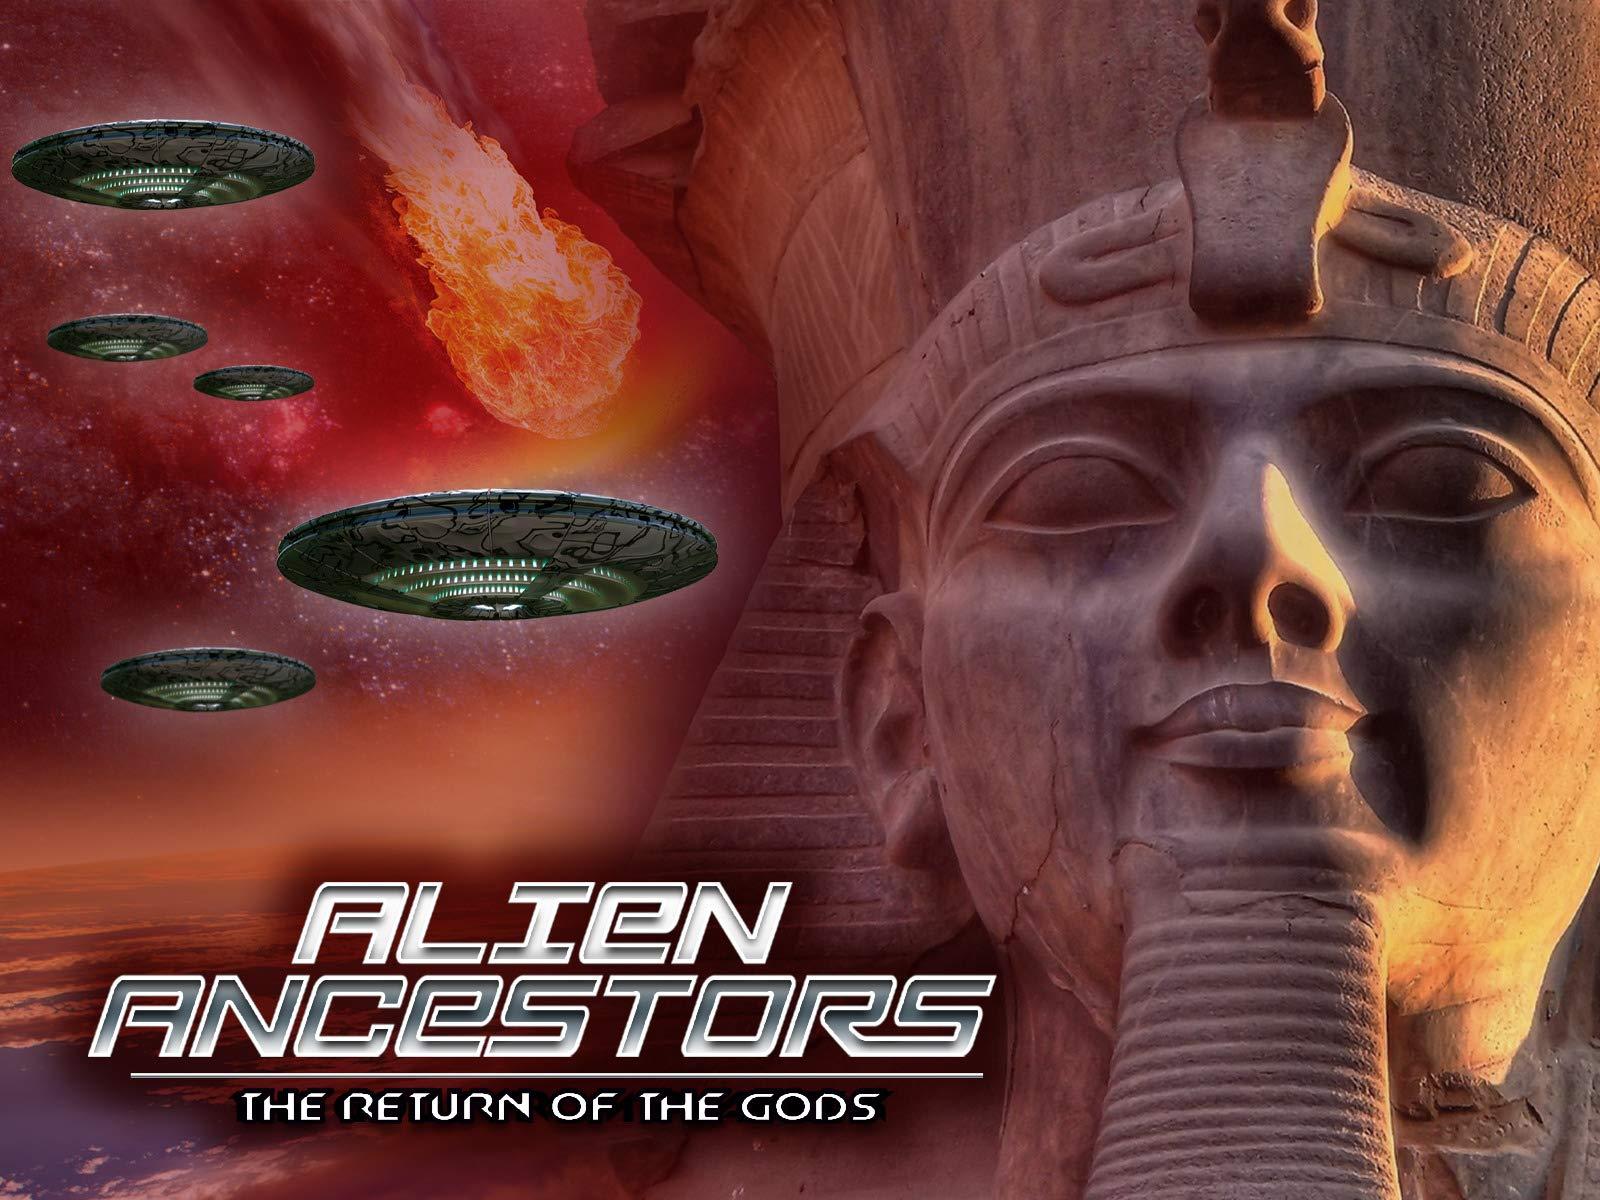 Alien Ancestors: The Return of the Gods - Season 1